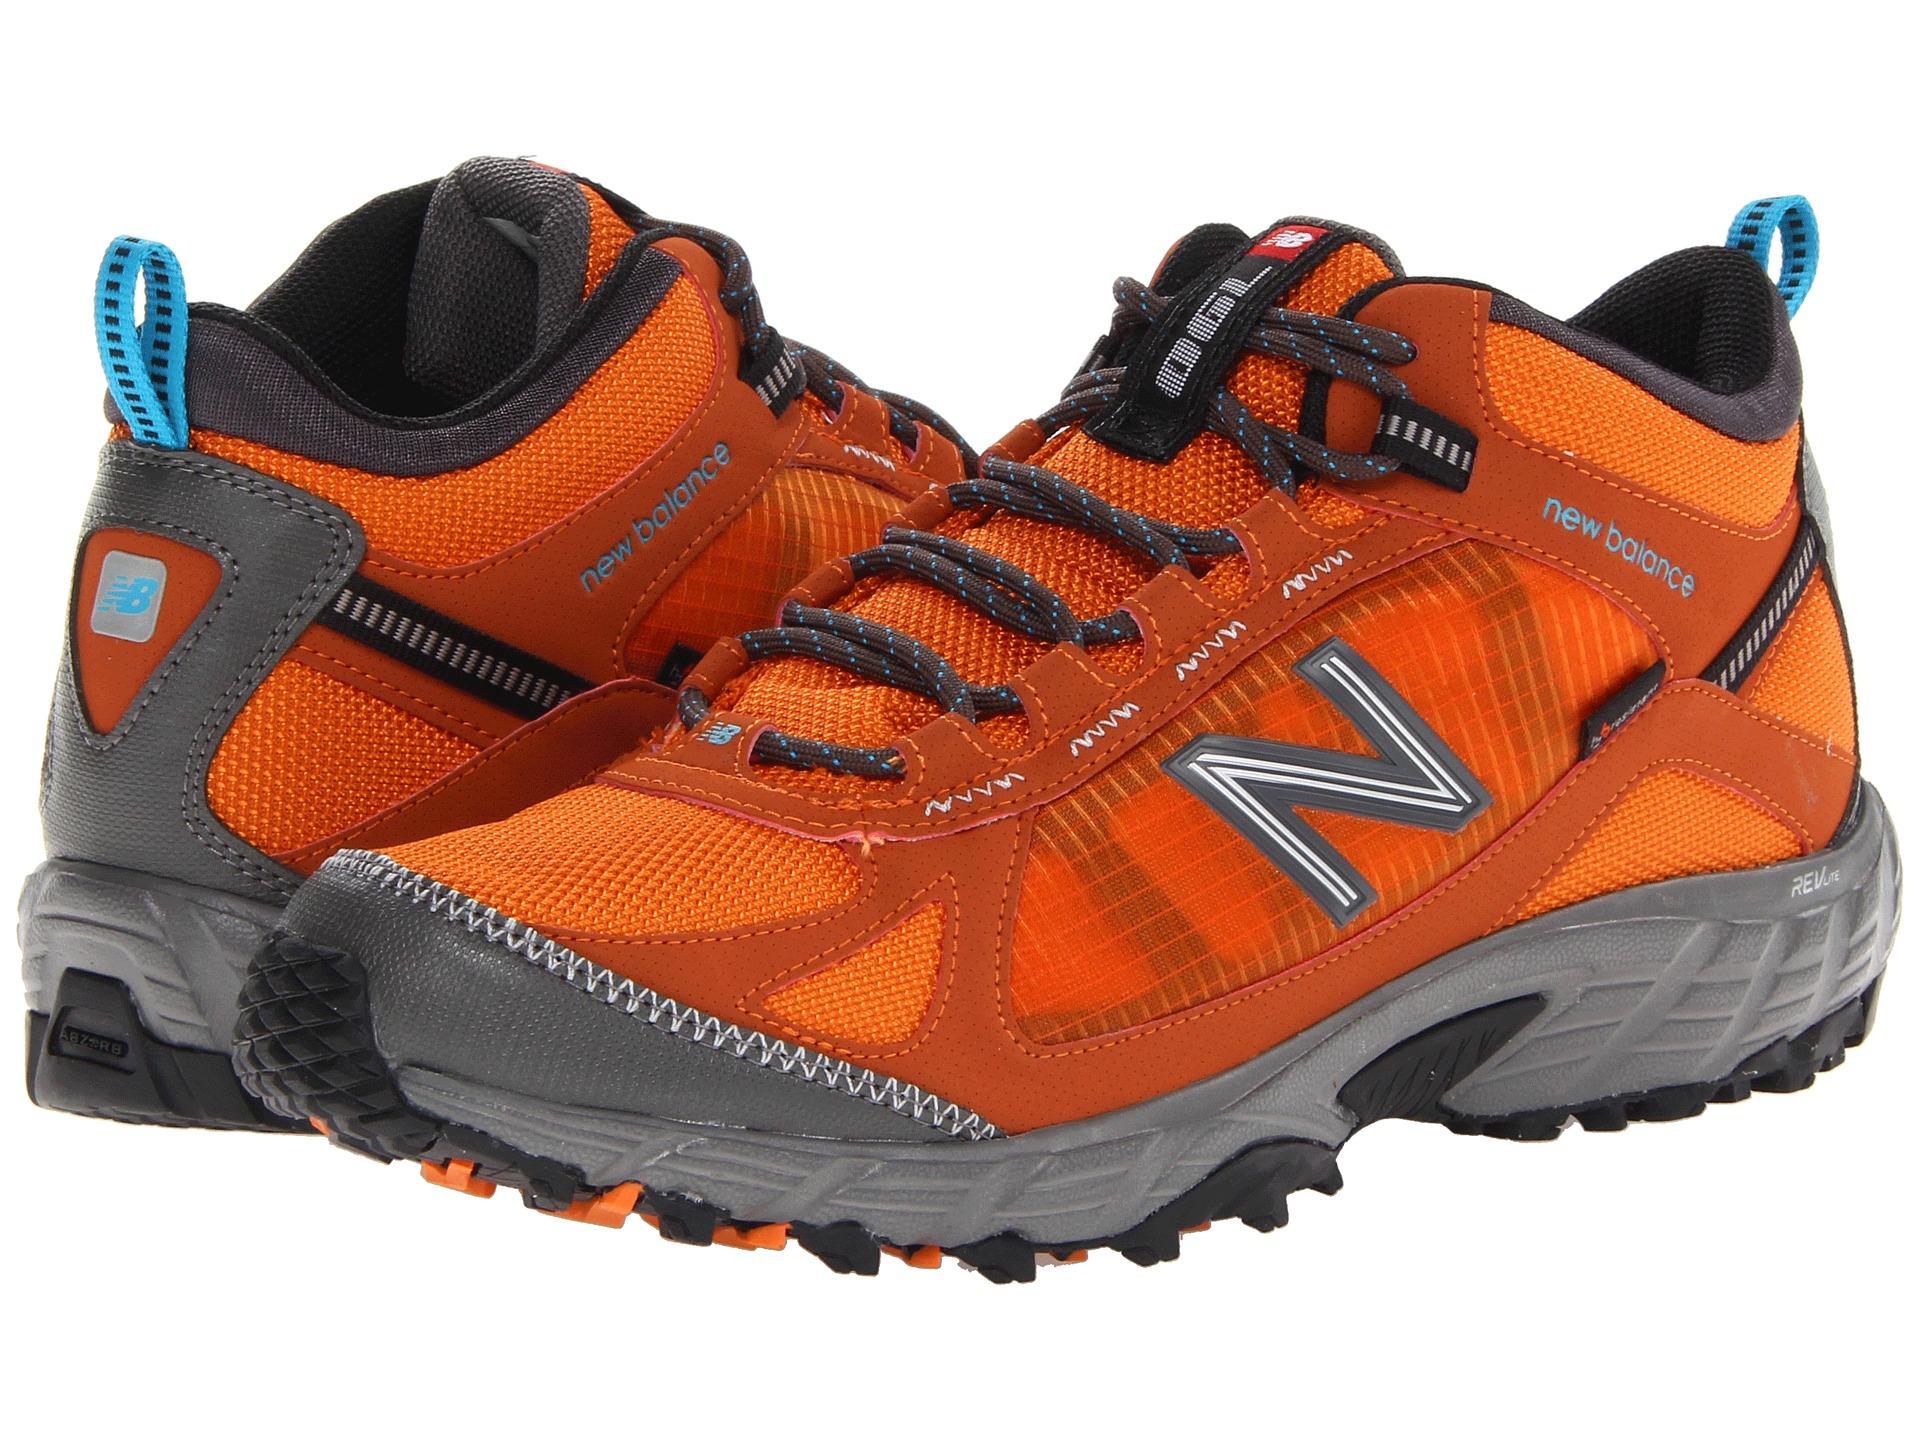 Mens New Balance 790 Trail Boot